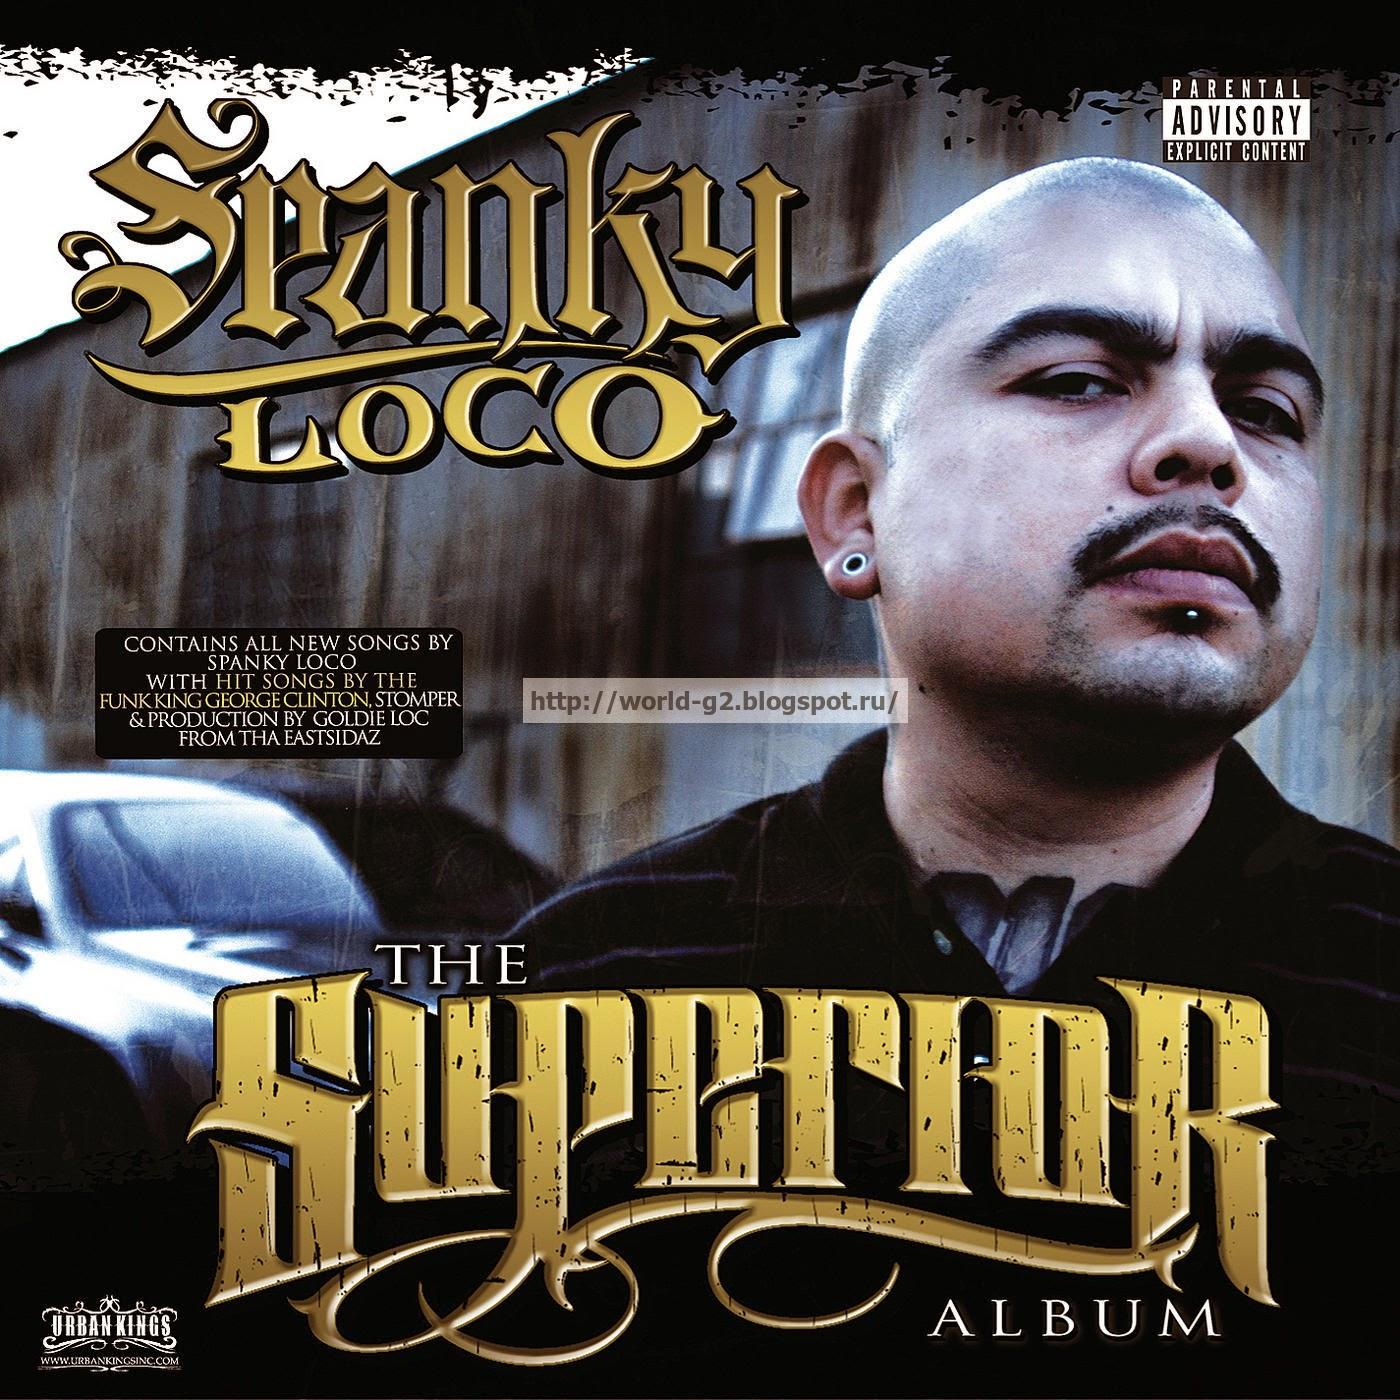 http://4.bp.blogspot.com/-eZk66qu6L48/U66W42RRp6I/AAAAAAAABOk/p5-Wir4Frsc/s1600/Spanky_Loco_-_The_Superior_Album_-_Front.jpg